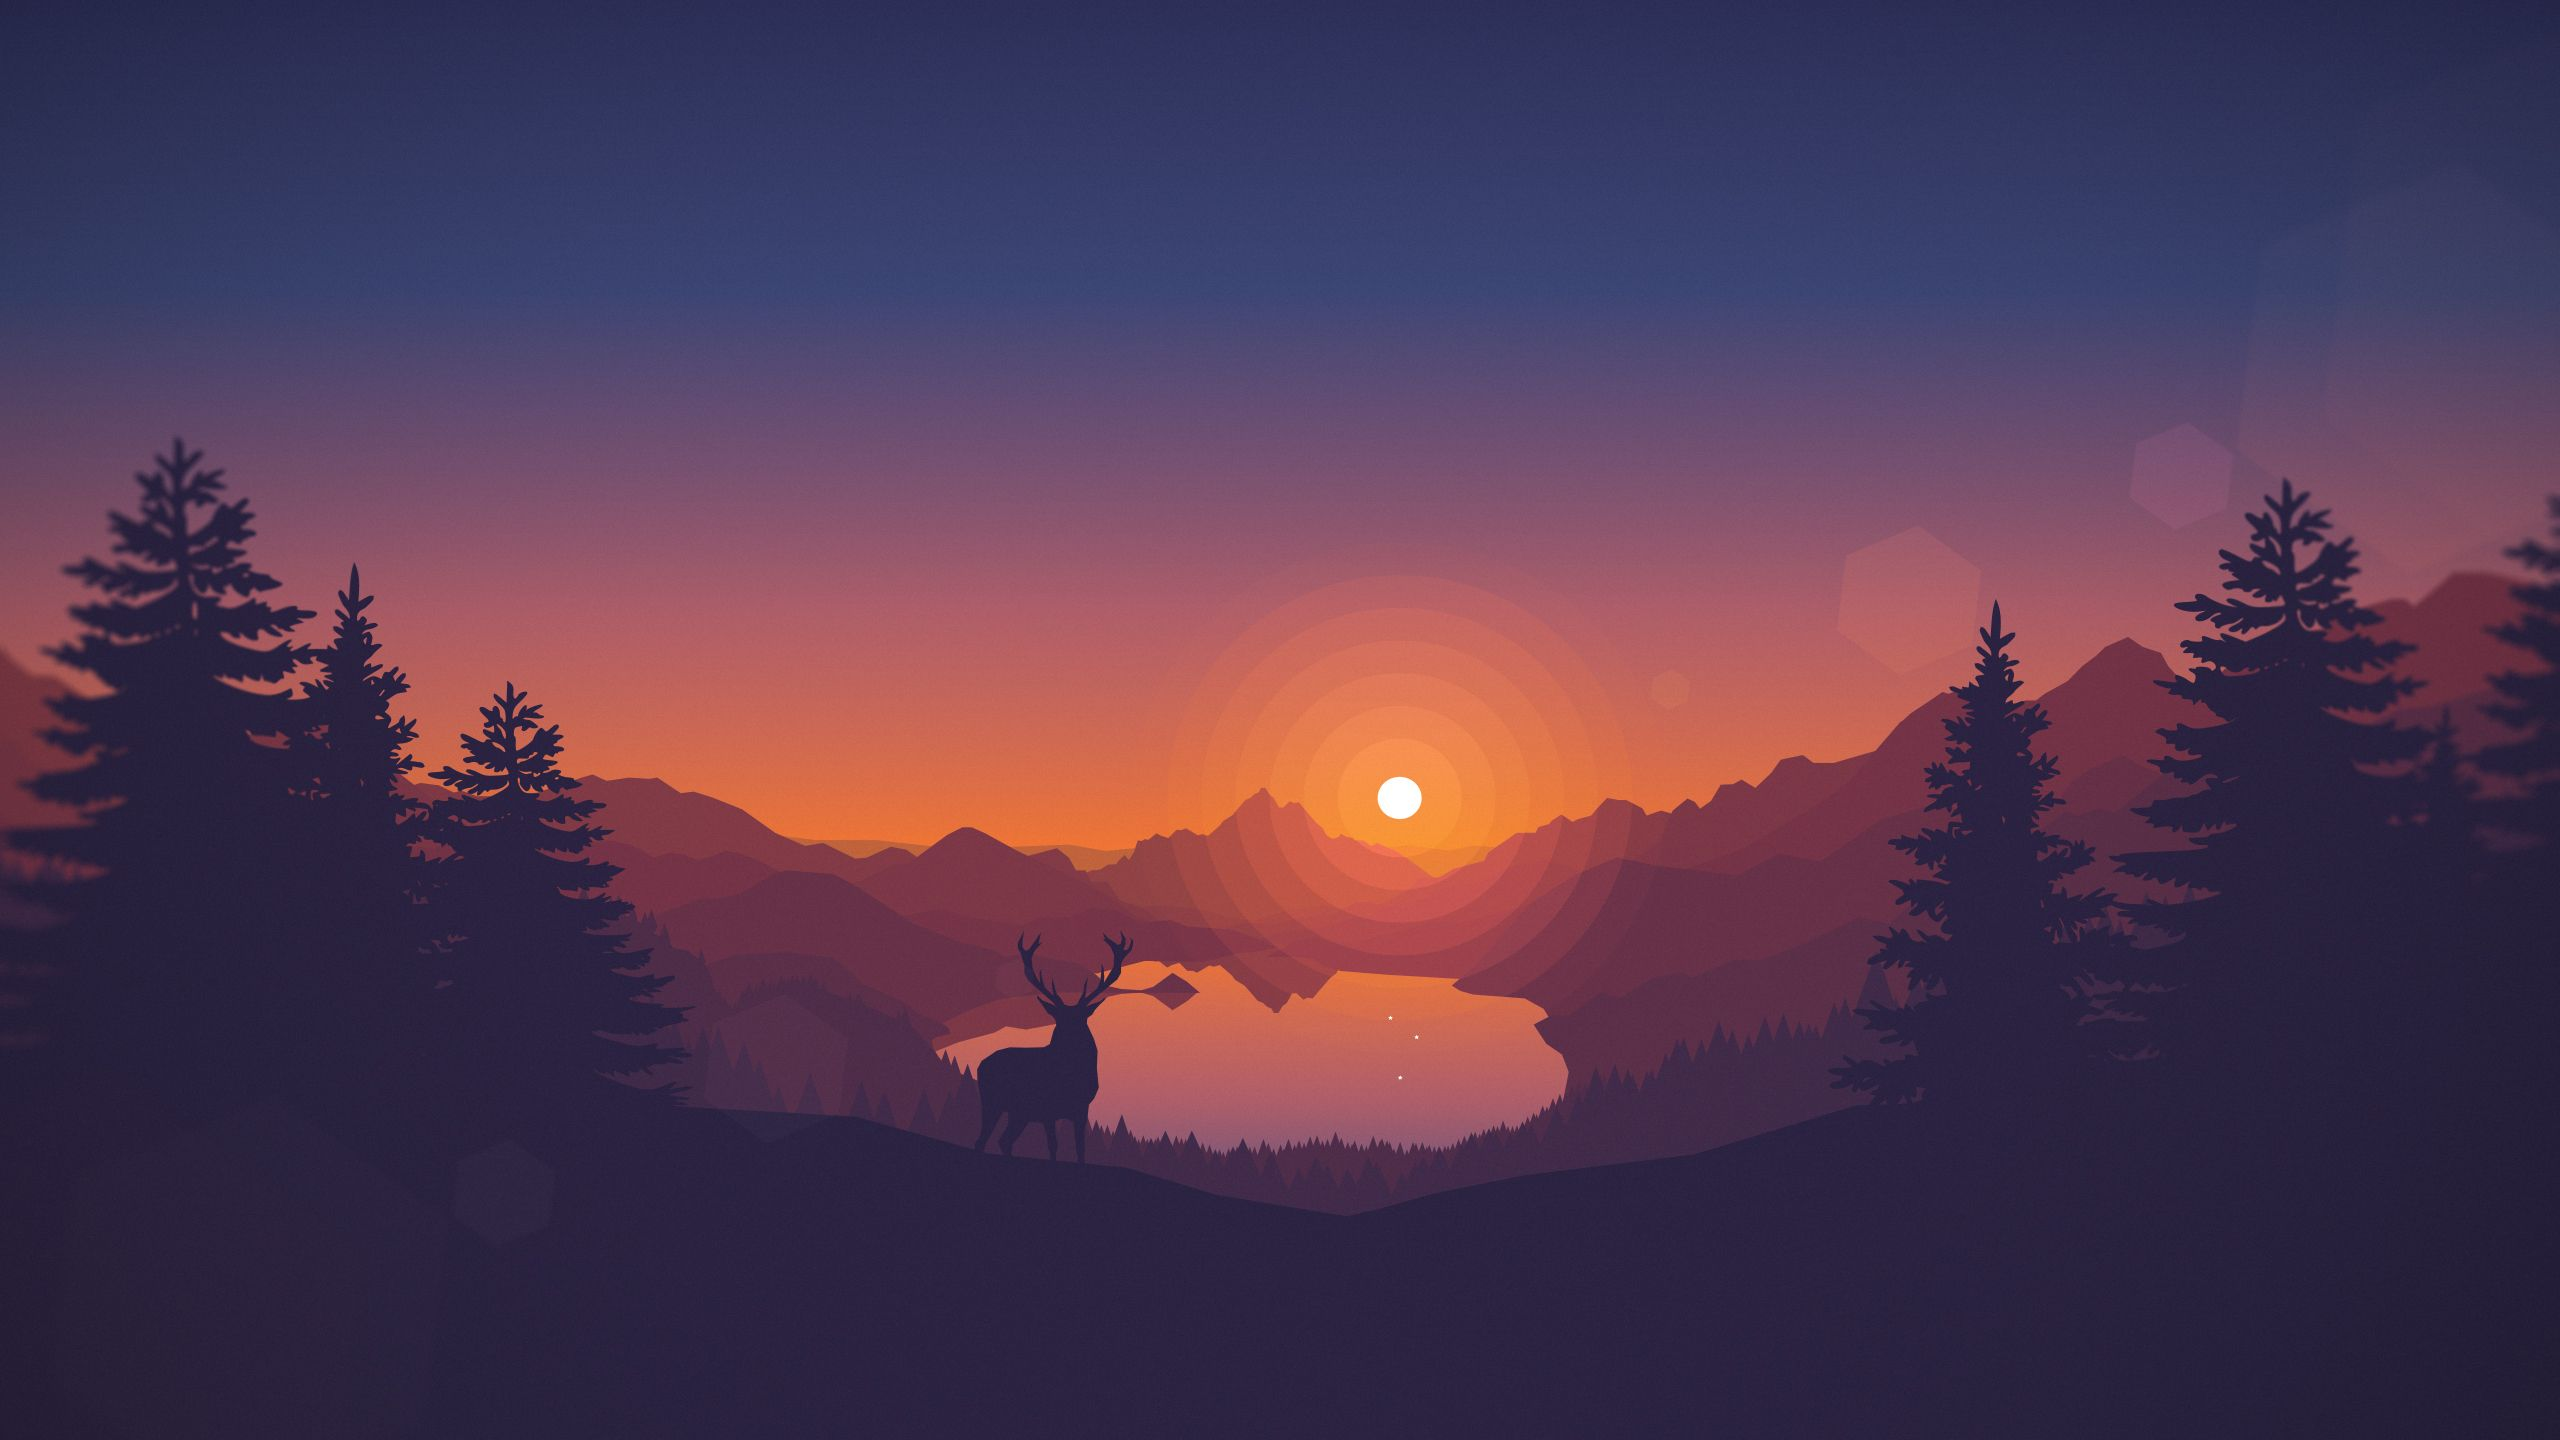 Lakeside Sunset 2560x1440 Jpg By Louis Coyle Sunset Wallpaper Deer Wallpaper 4k Desktop Wallpapers